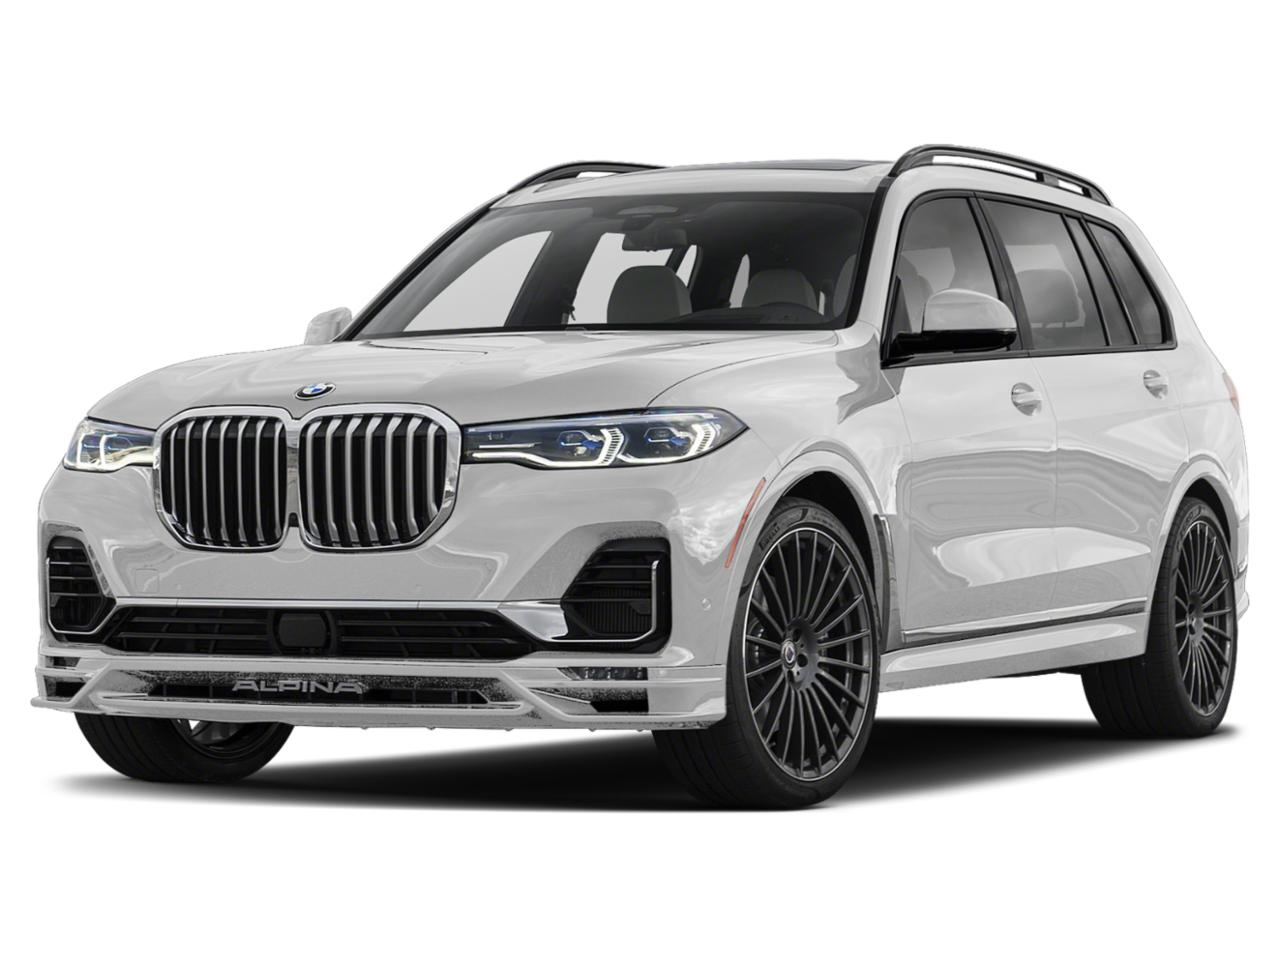 2022 BMW X7 ALPINA XB7 Vehicle Photo in PLANO, TX 75024-3599